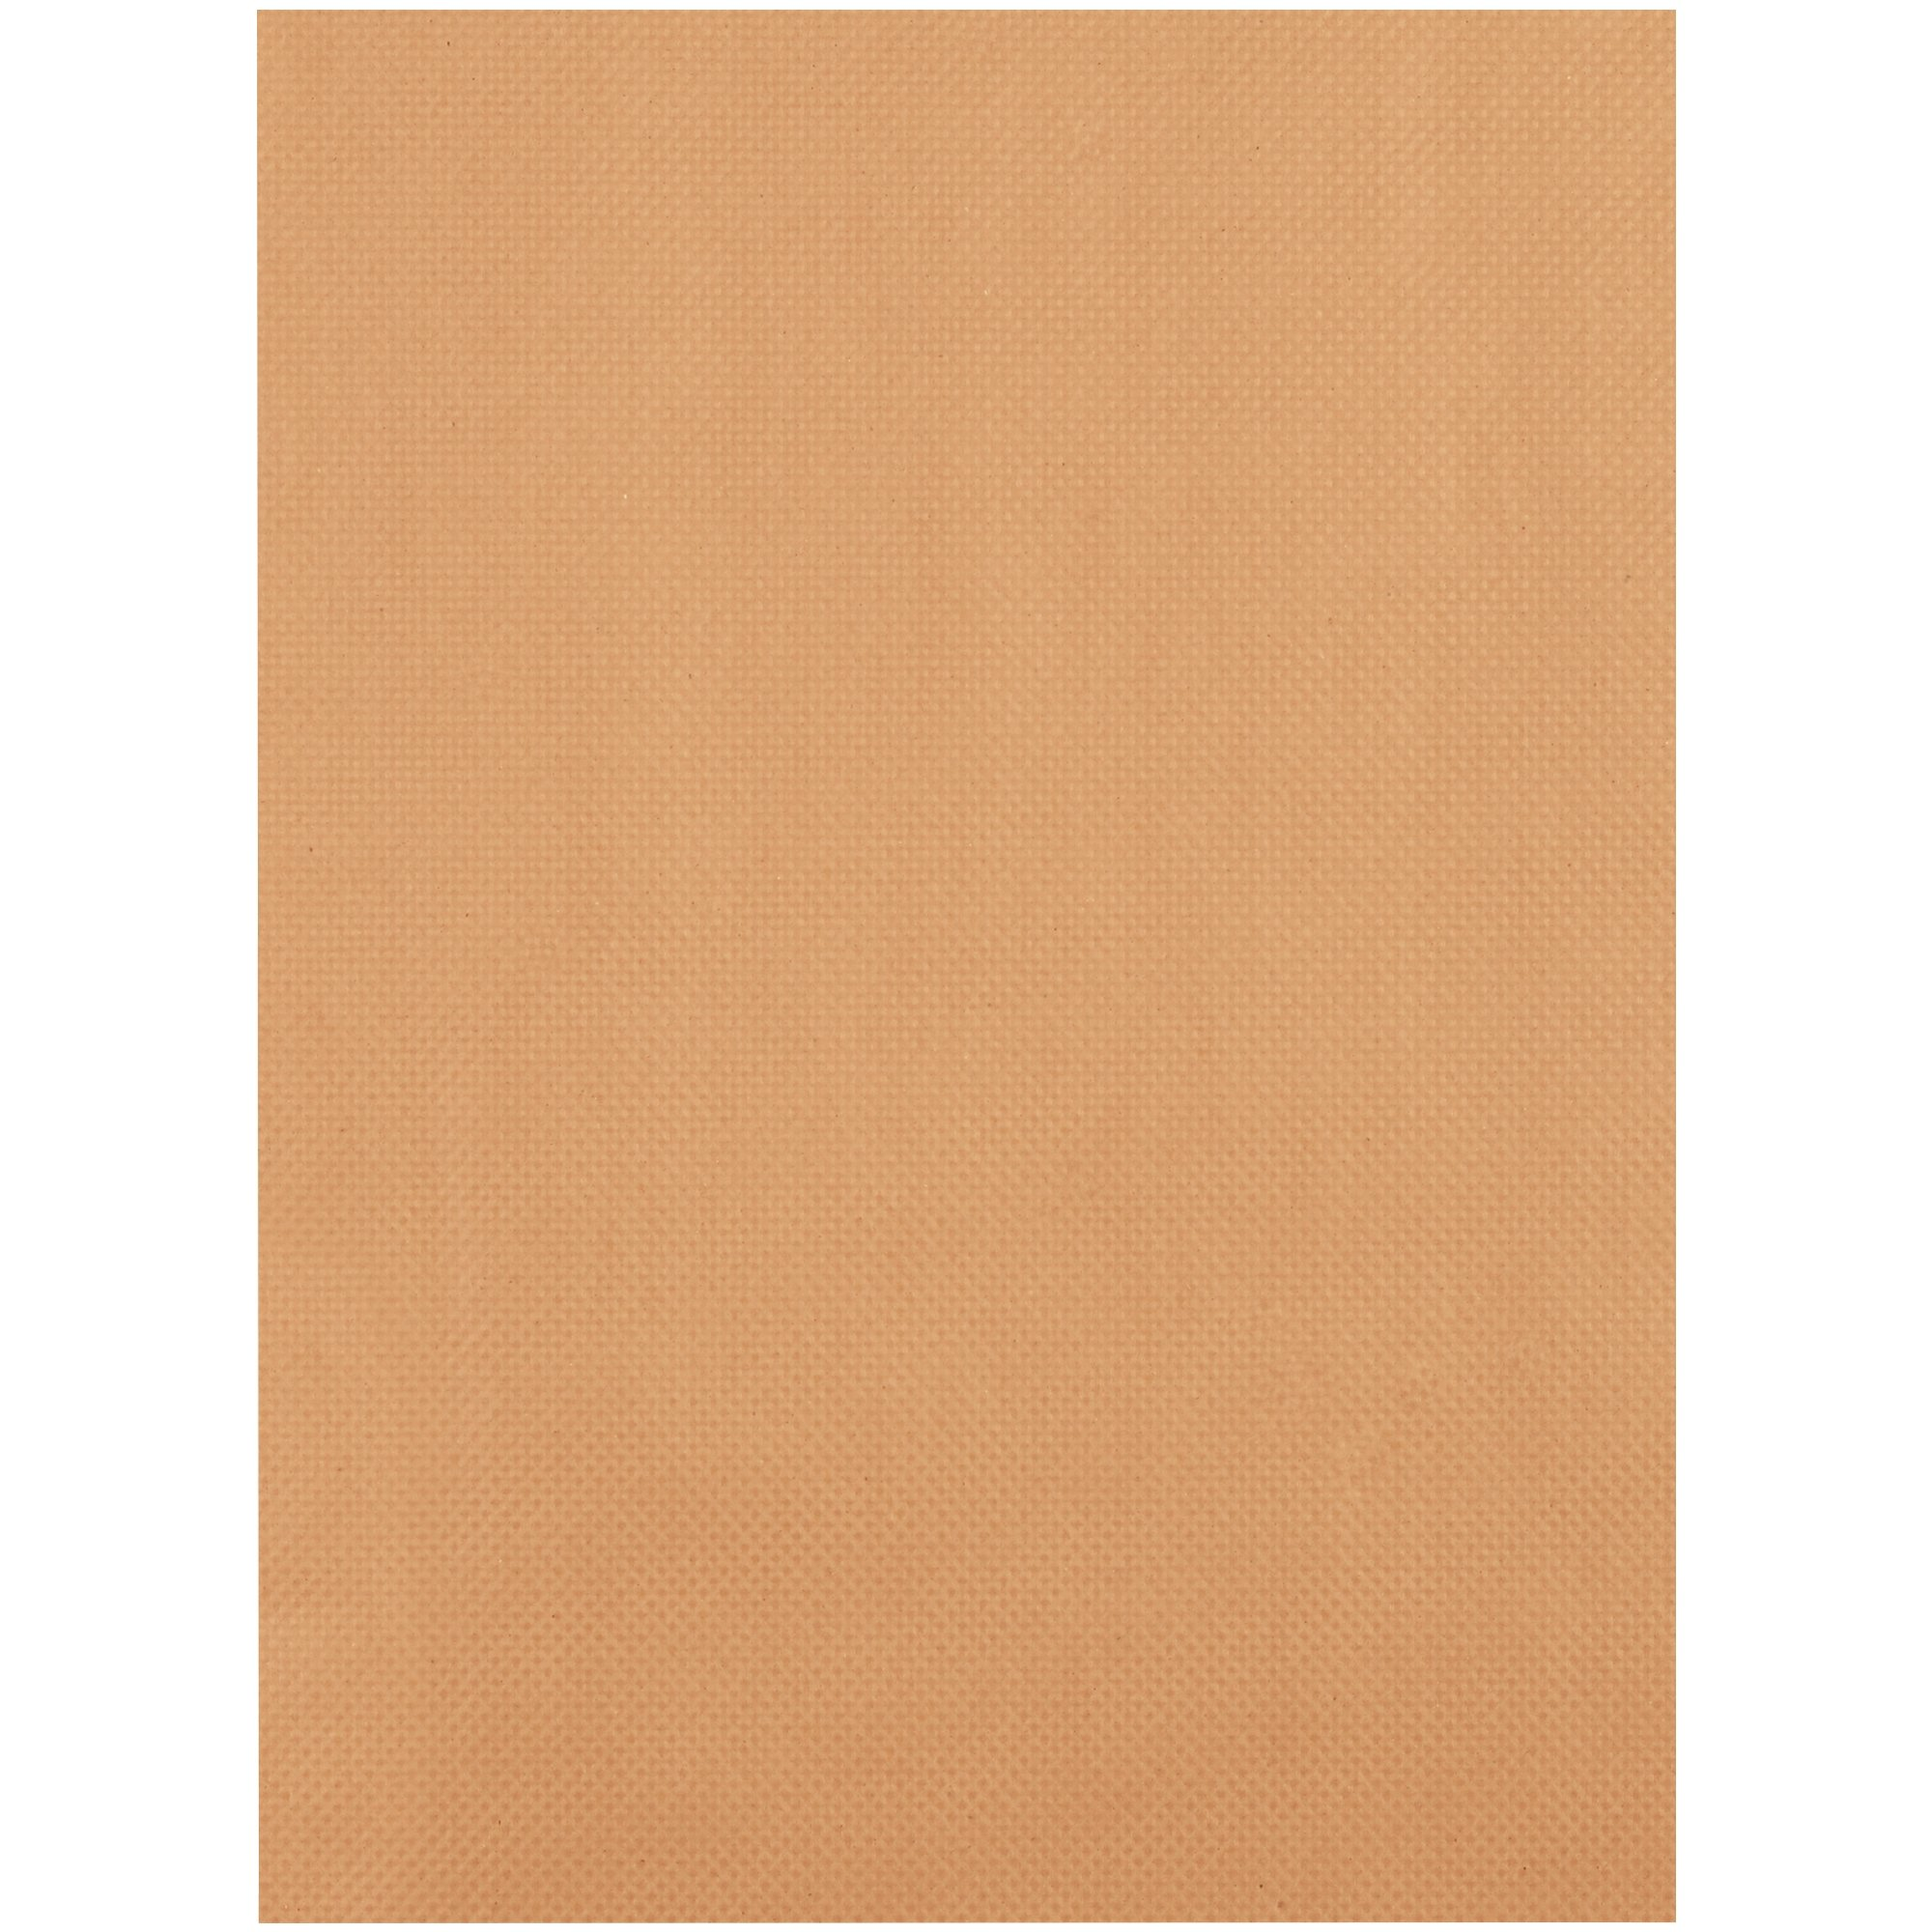 Aviditi IKP1824 60# Indented Kraft Paper Rolls, 18'' x 24'' (Pack of 415) by Aviditi